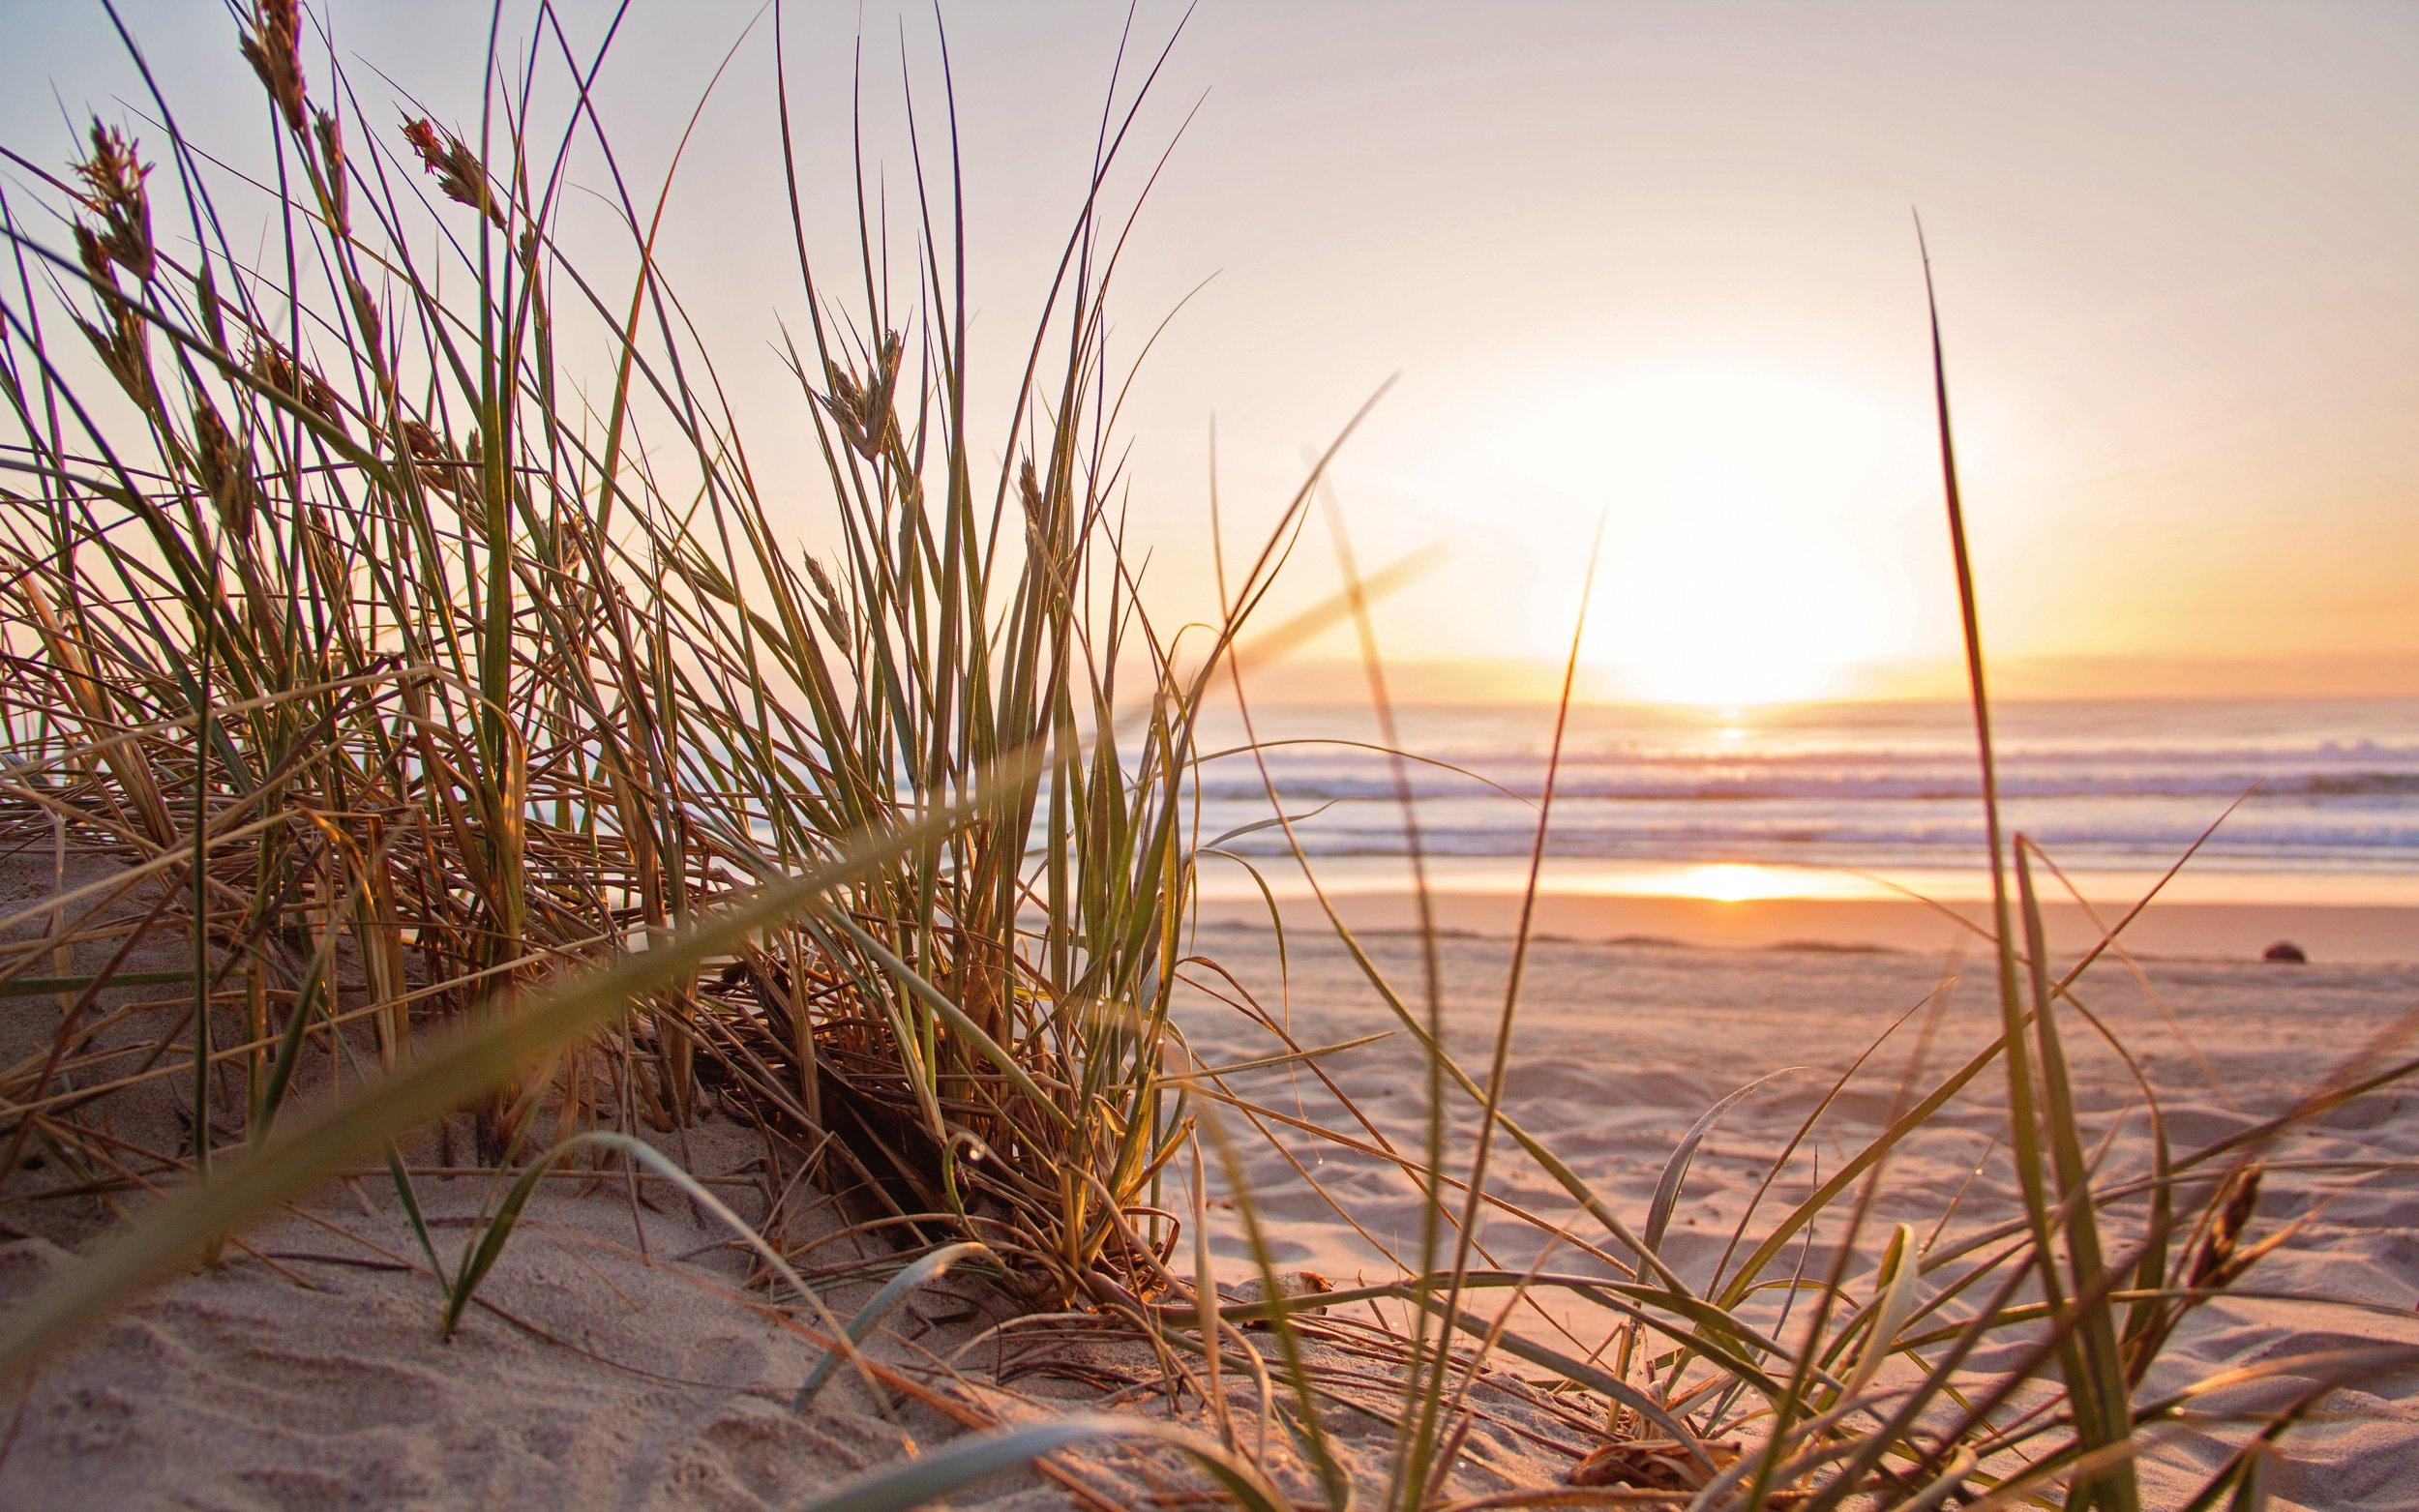 beach-dawn-evening-1300510.jpg